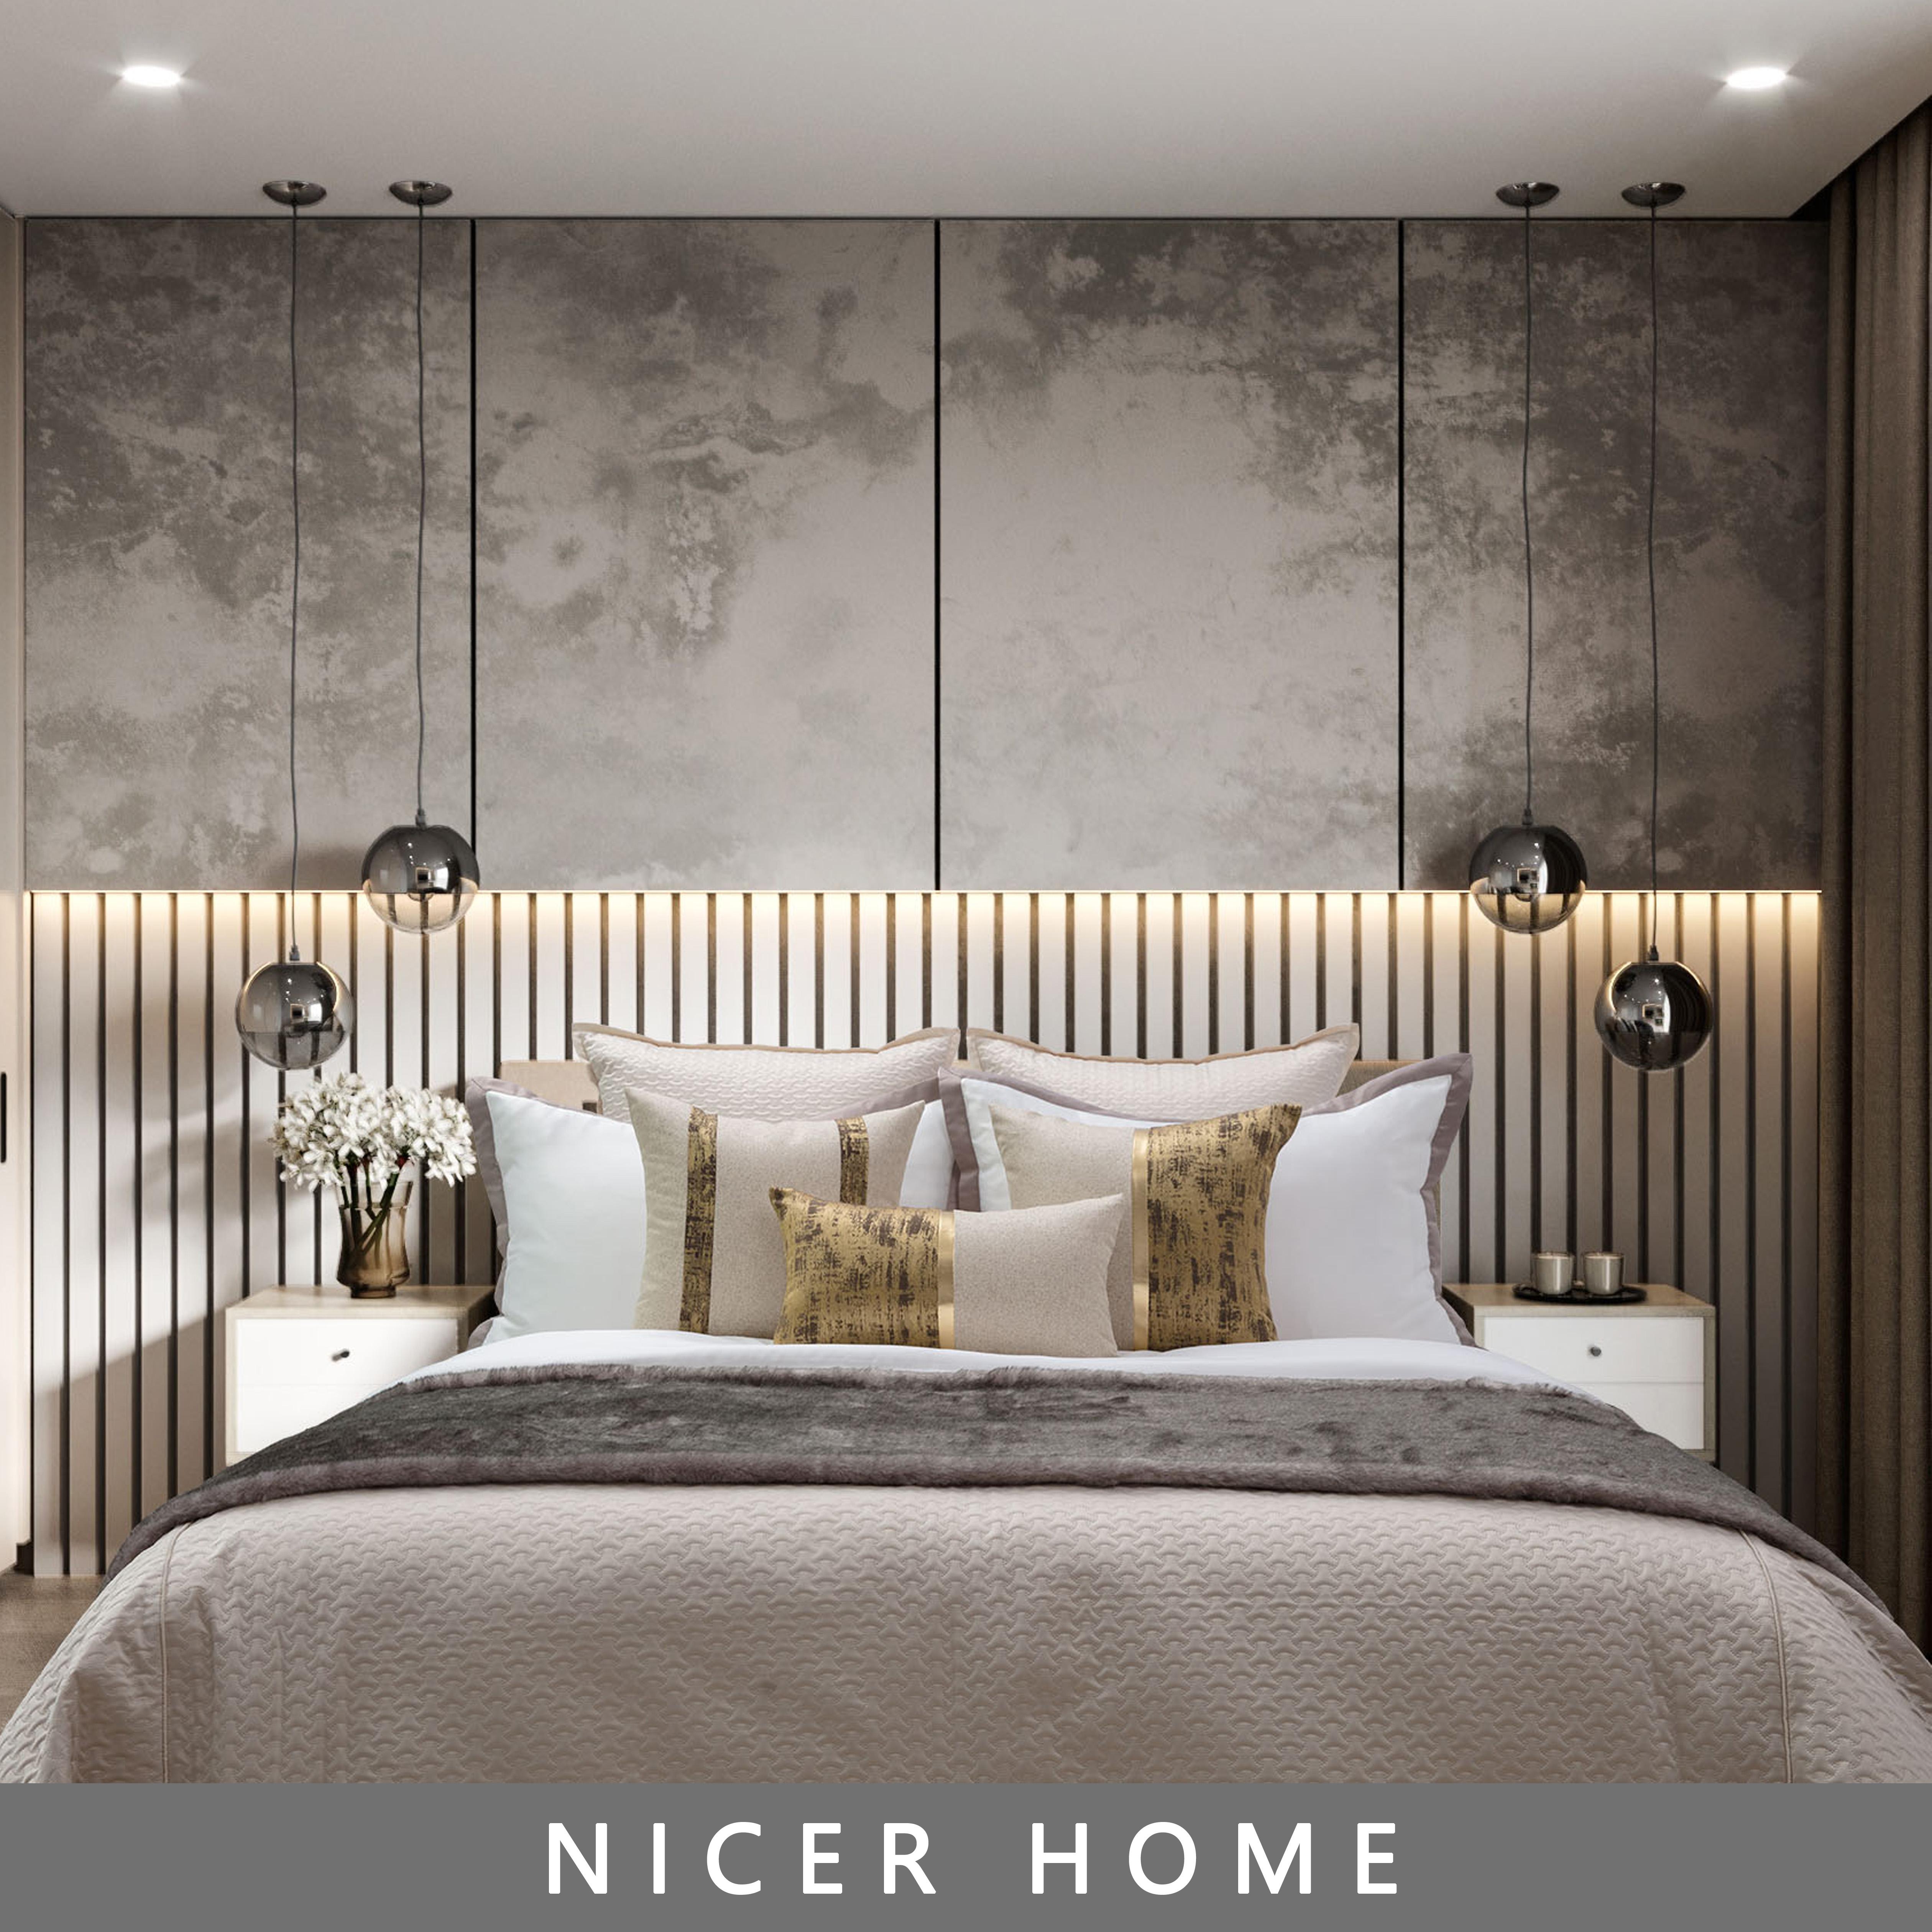 Modern luxury model room suite quilted bedding exhibition hall designer bedding suite Khaki 10 Piece Set